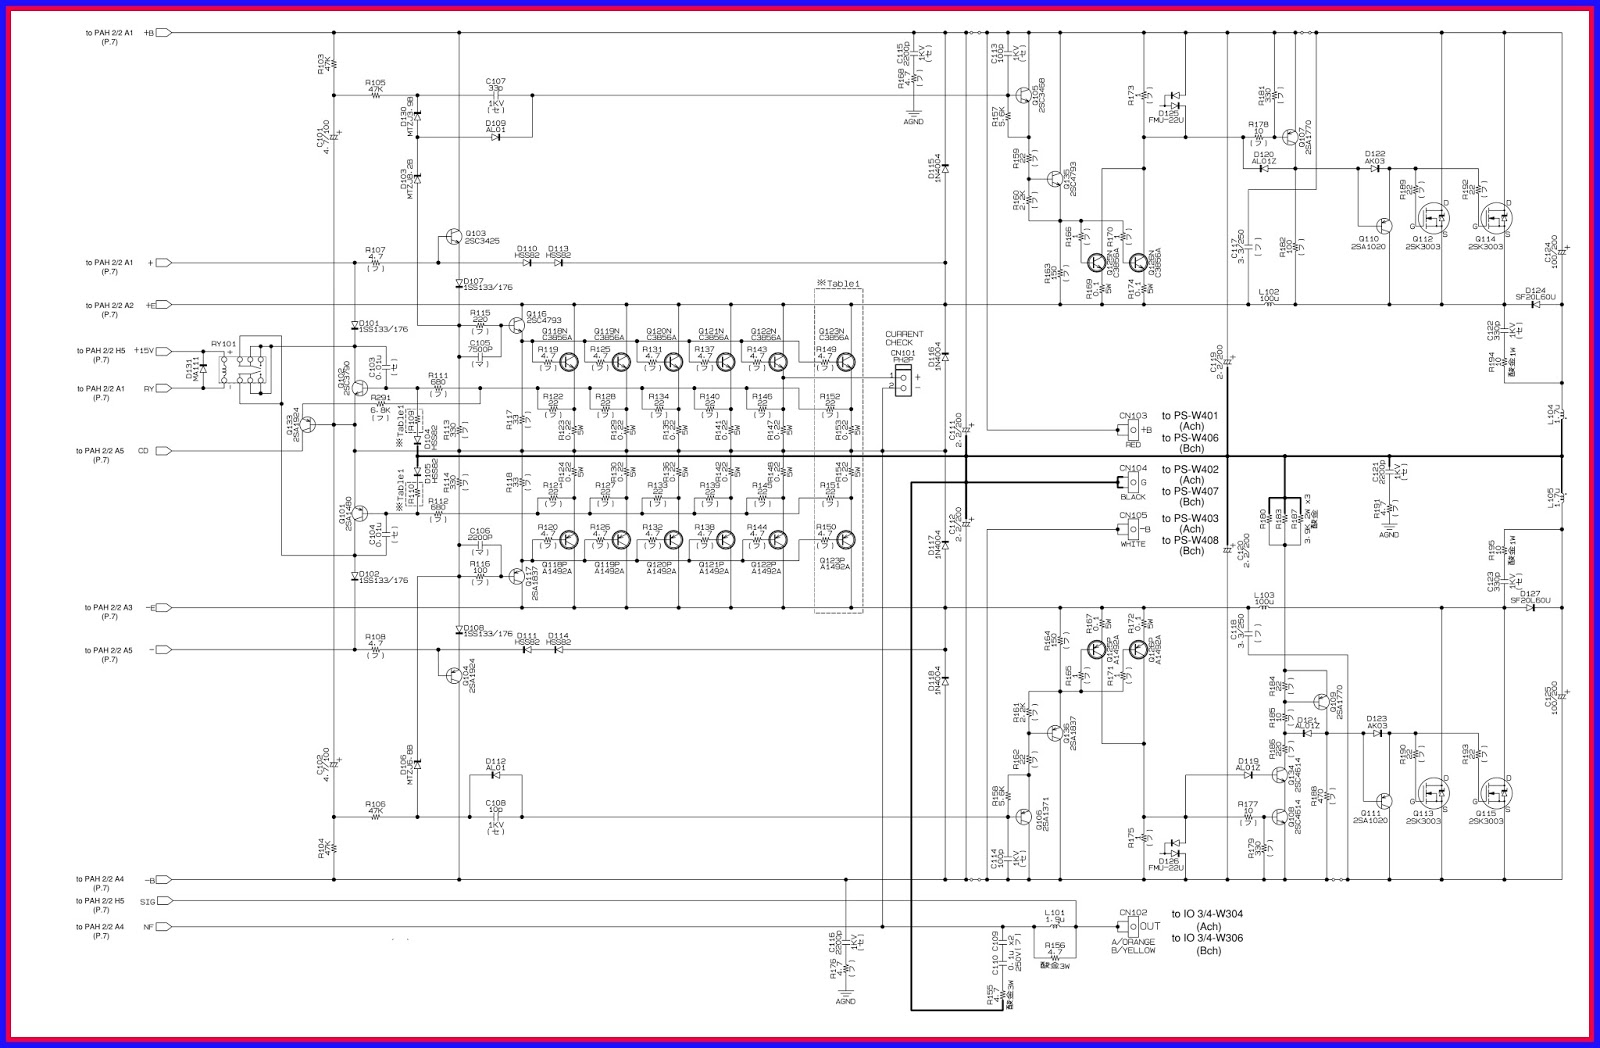 hight resolution of yamaha amp schematic wiring diagram megayamaha amp schematic wiring diagram yamaha amp schematics yamaha amp schematic